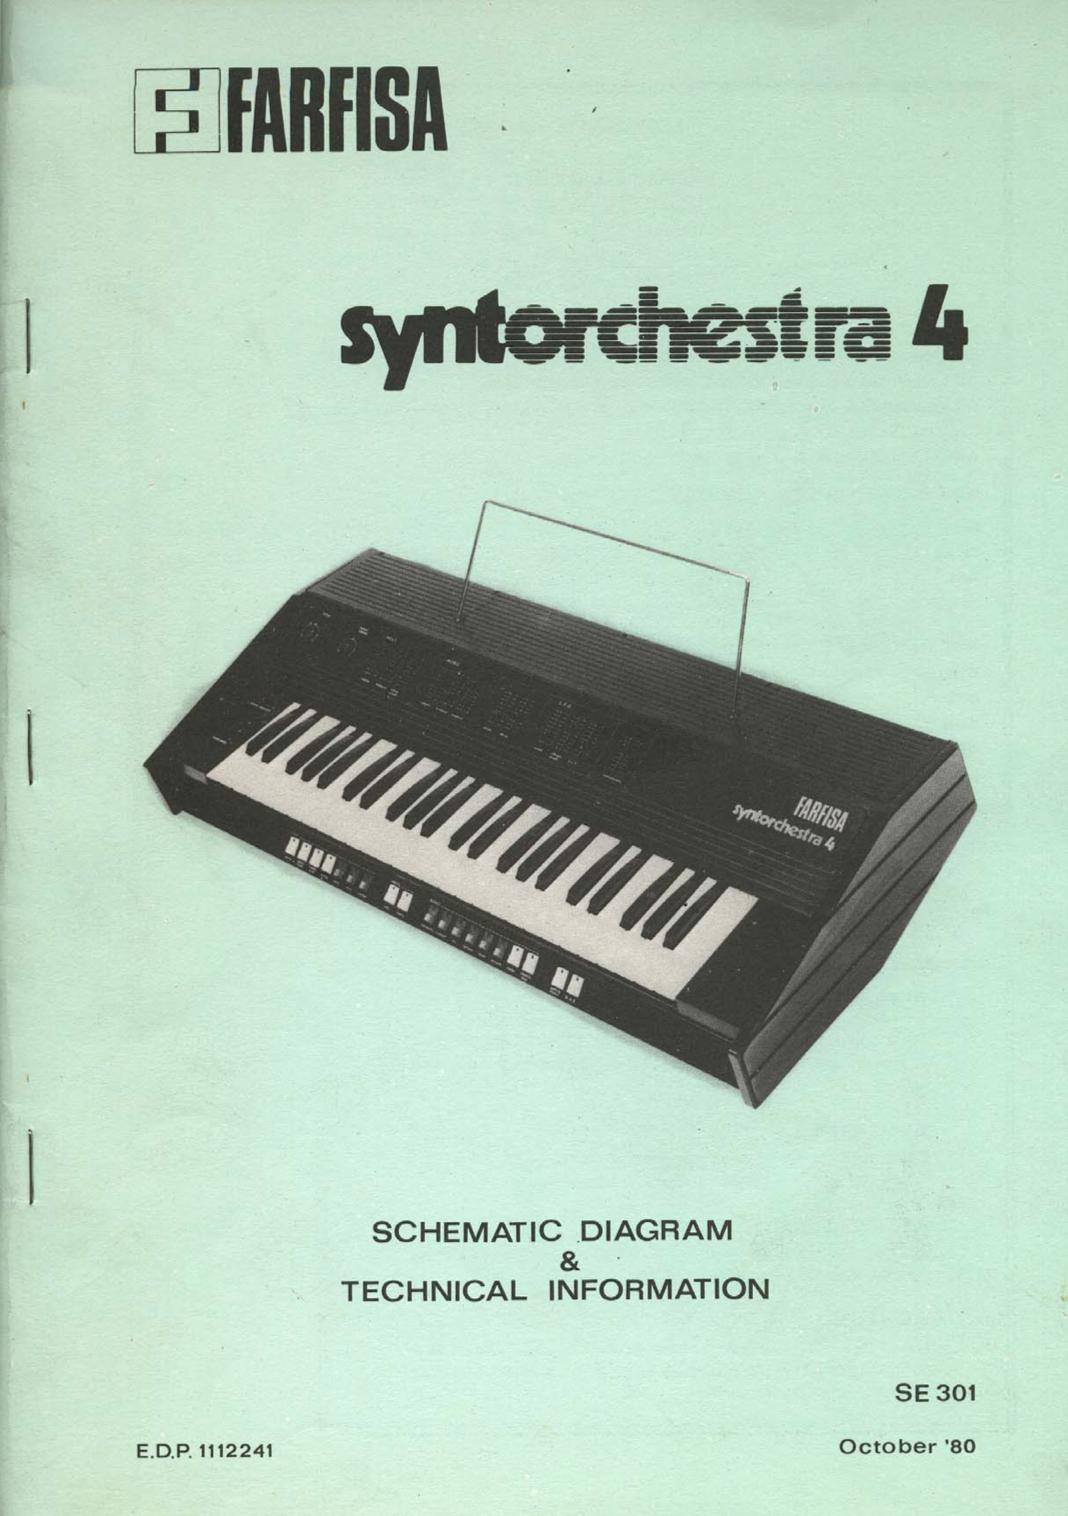 syntorch4